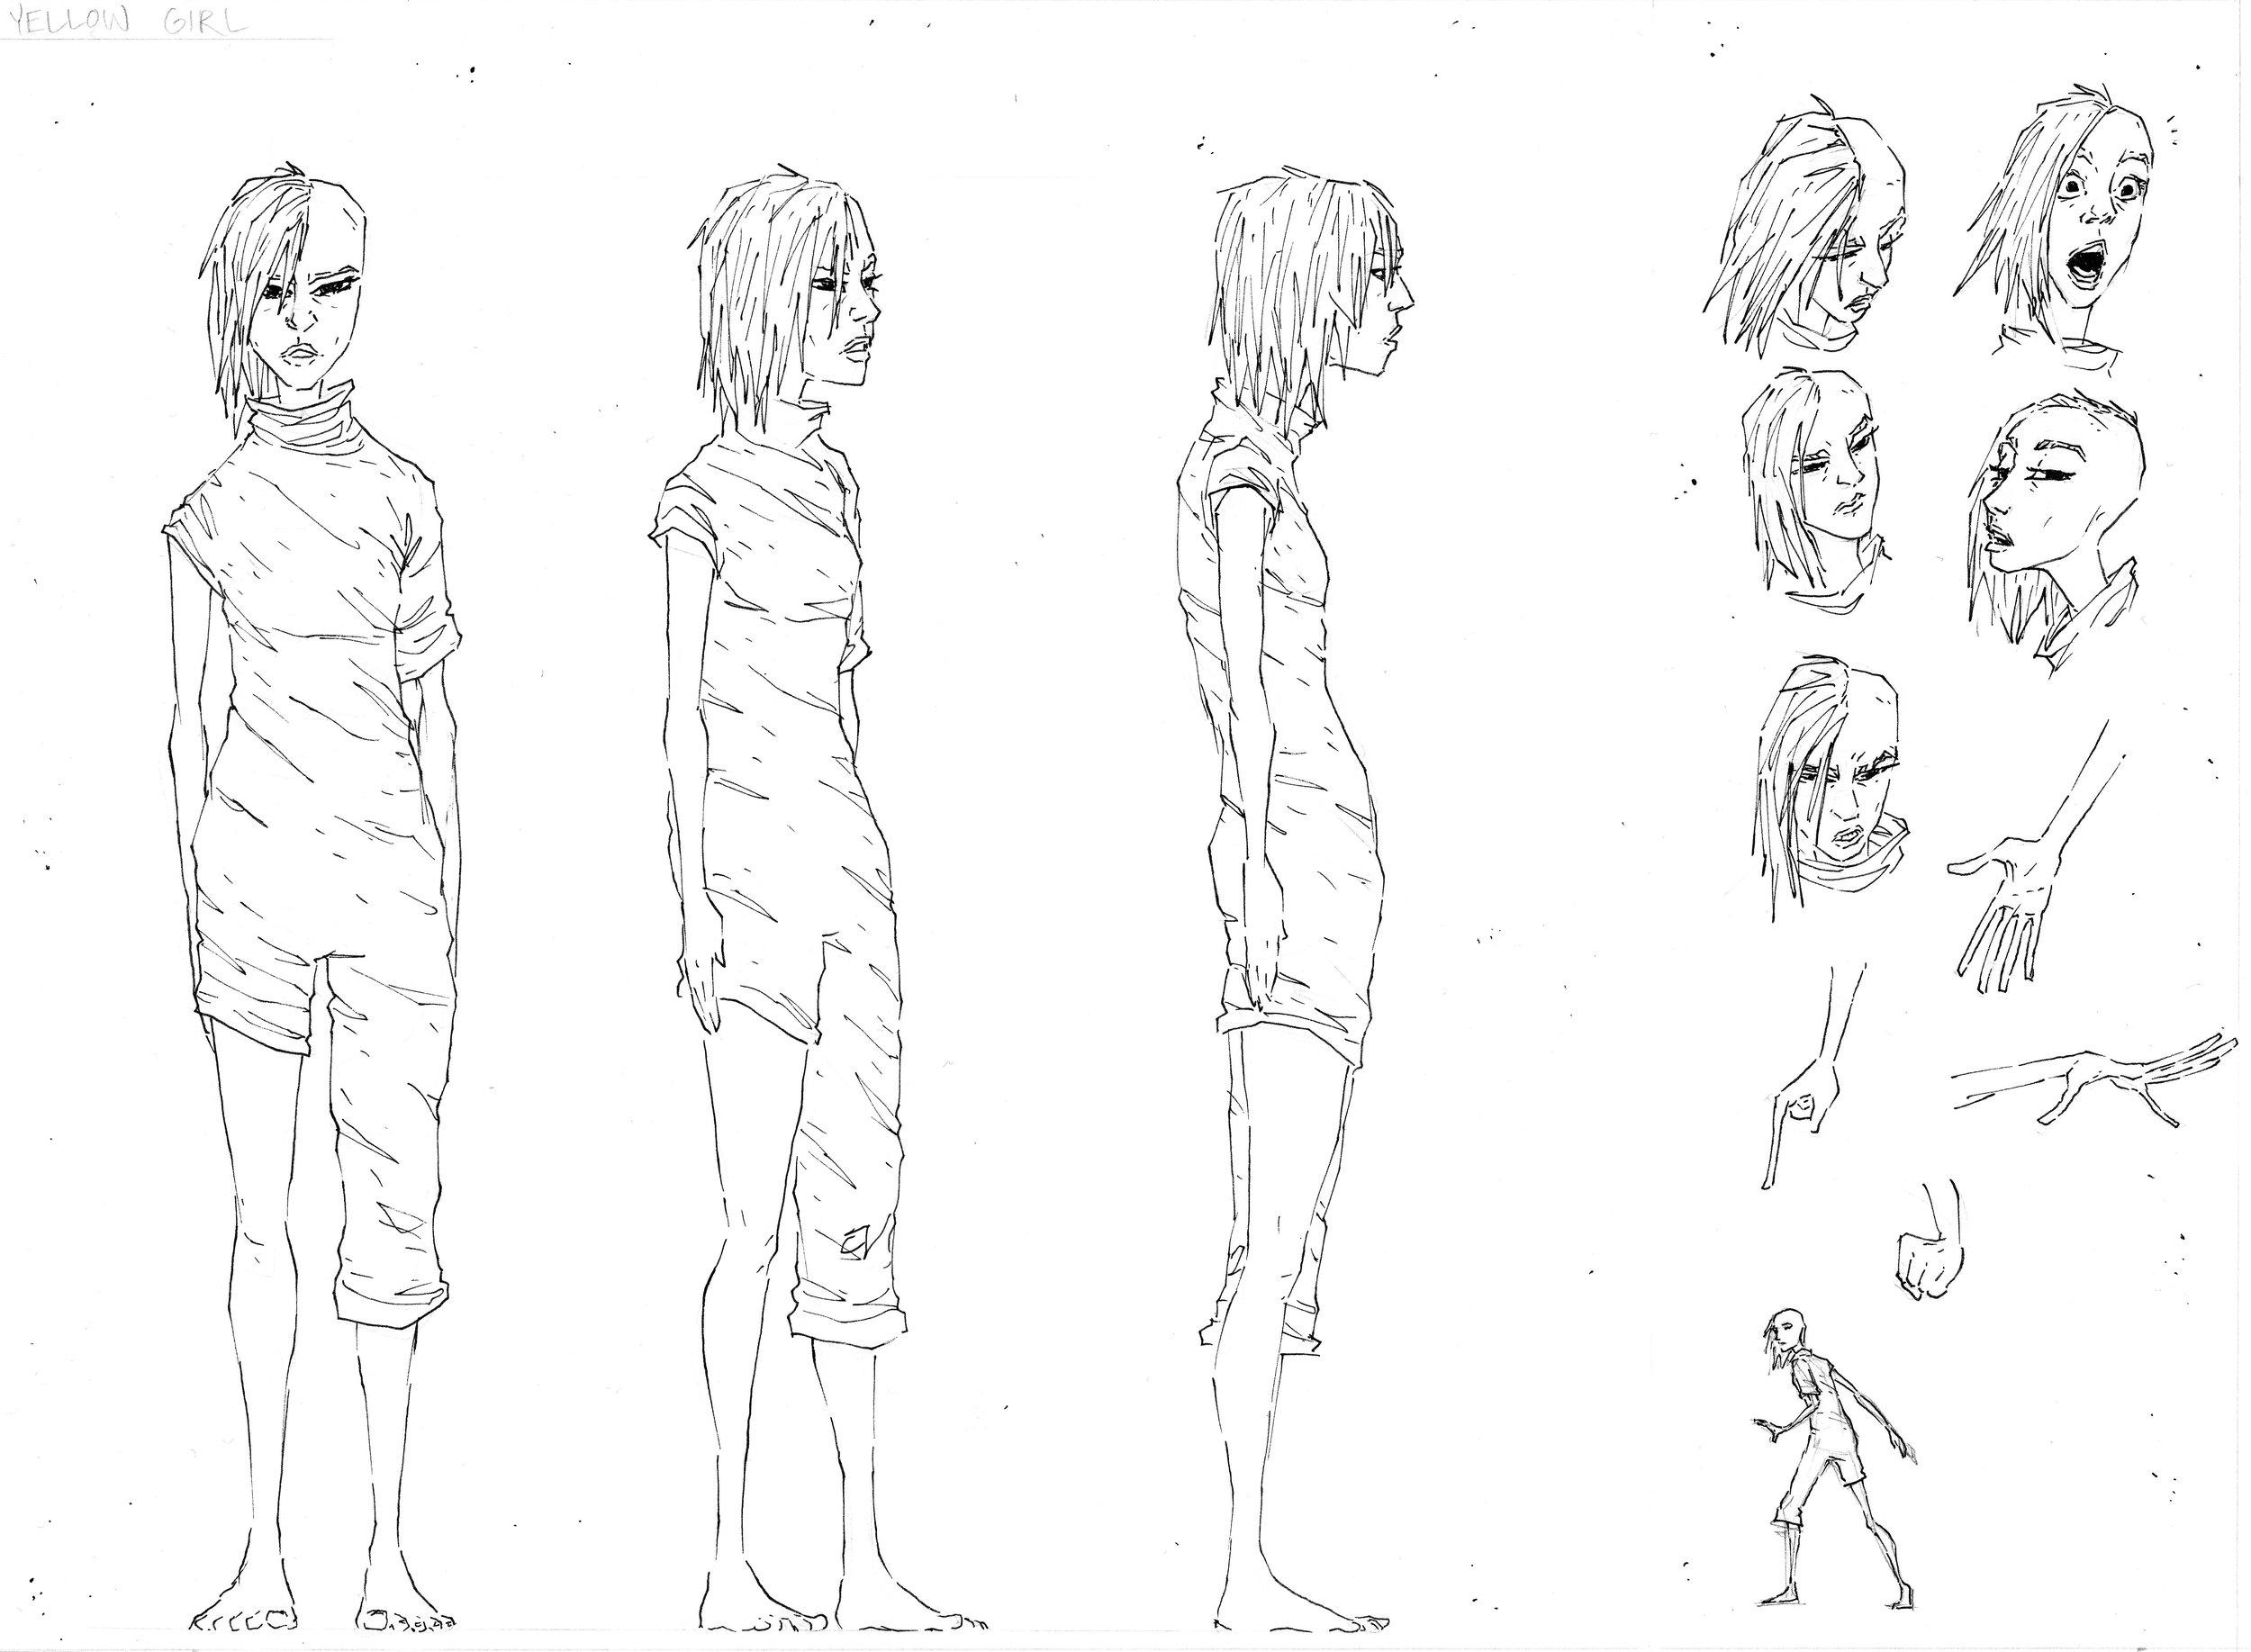 Proph_Yellowgirl design.jpg